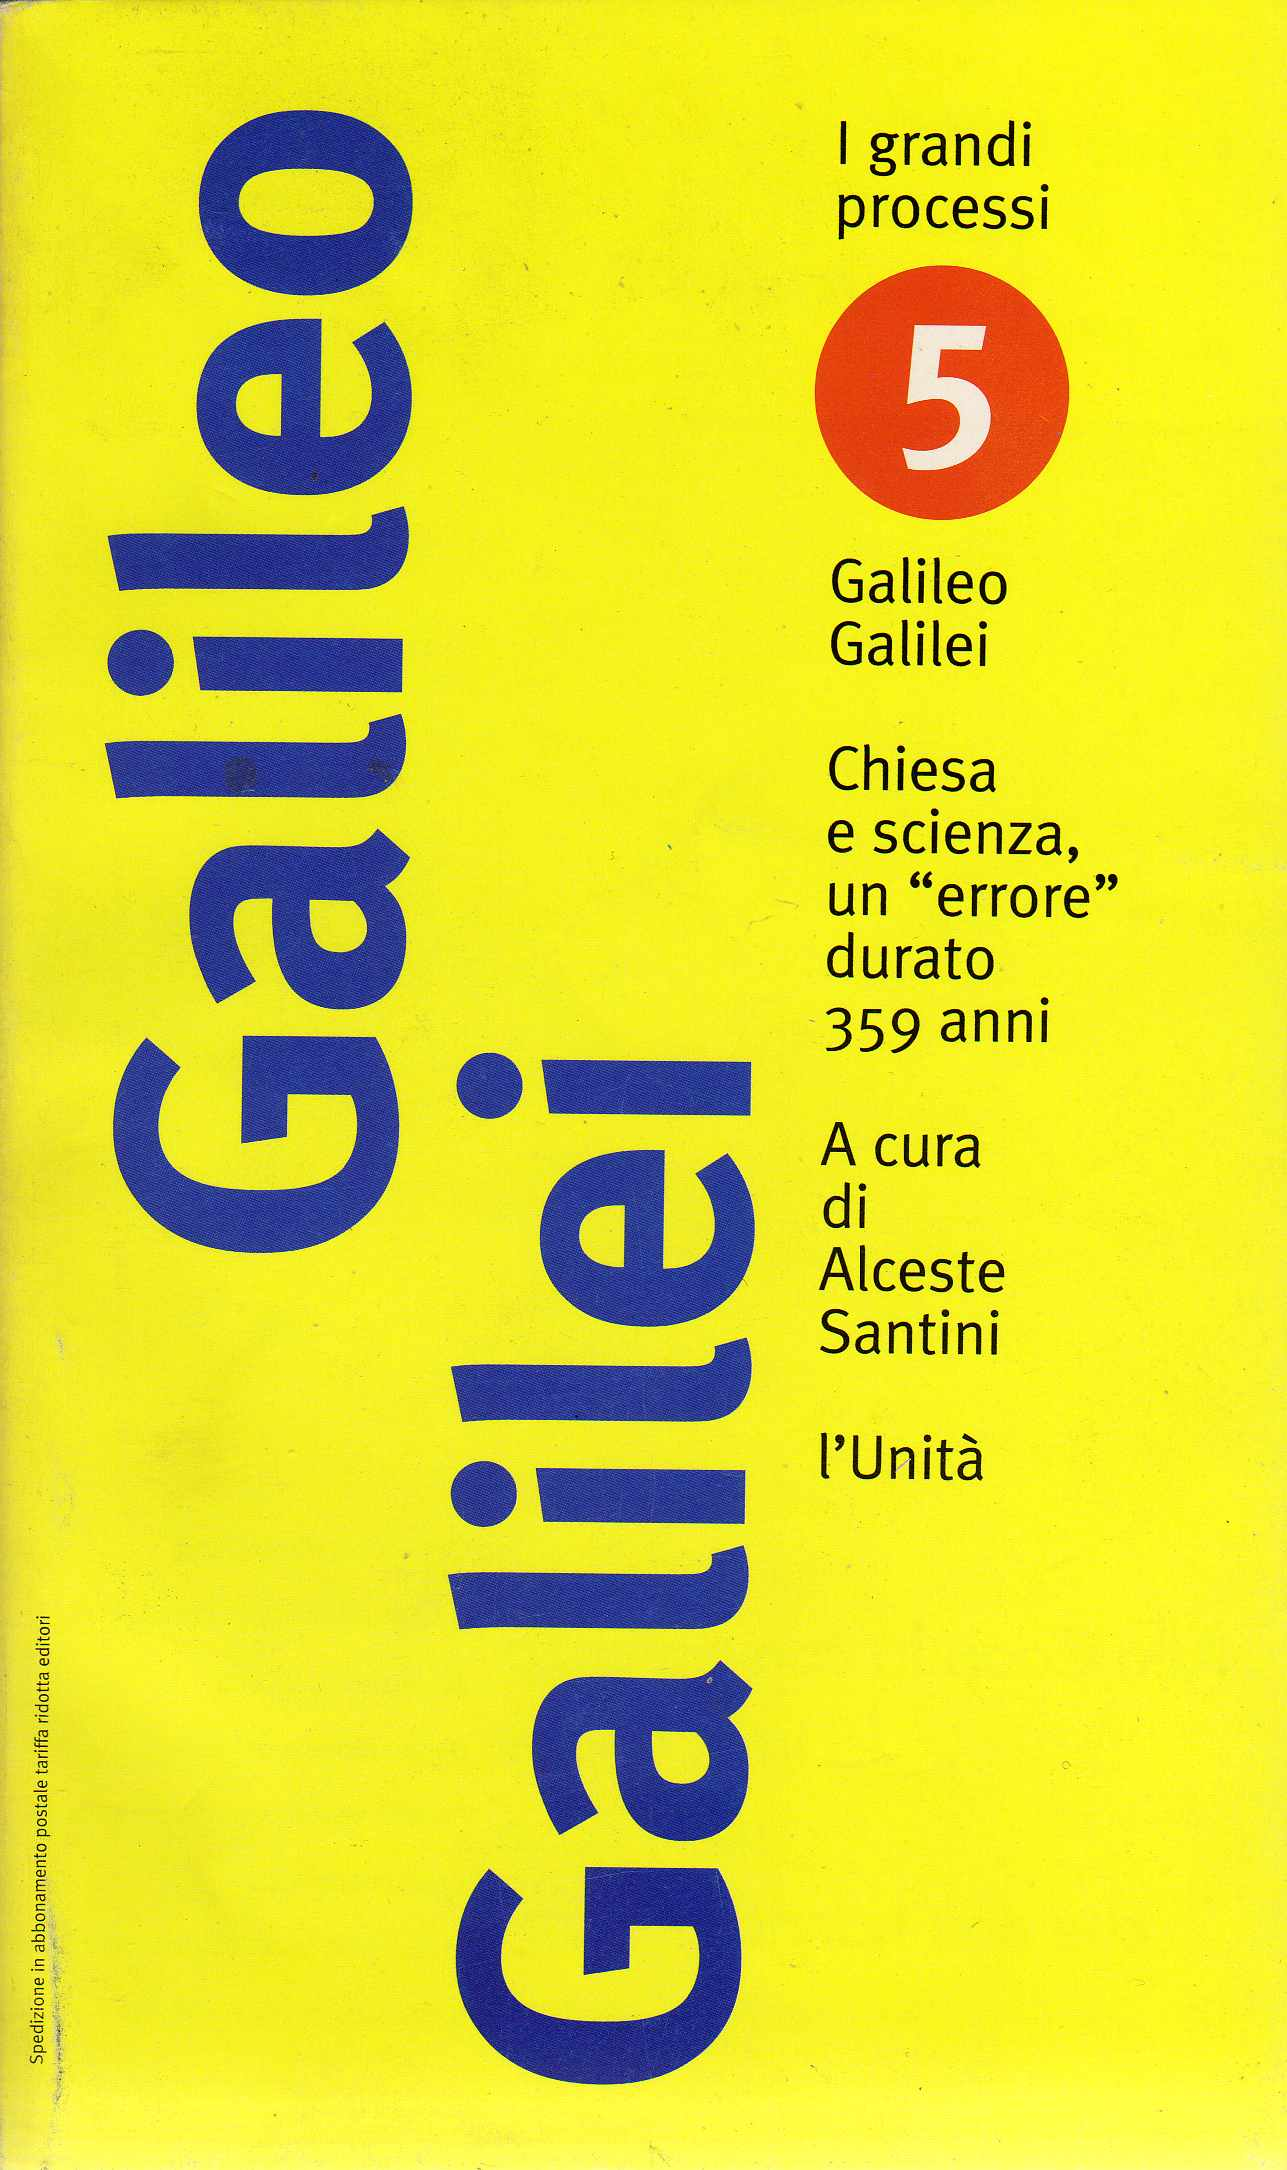 Processo Galilei